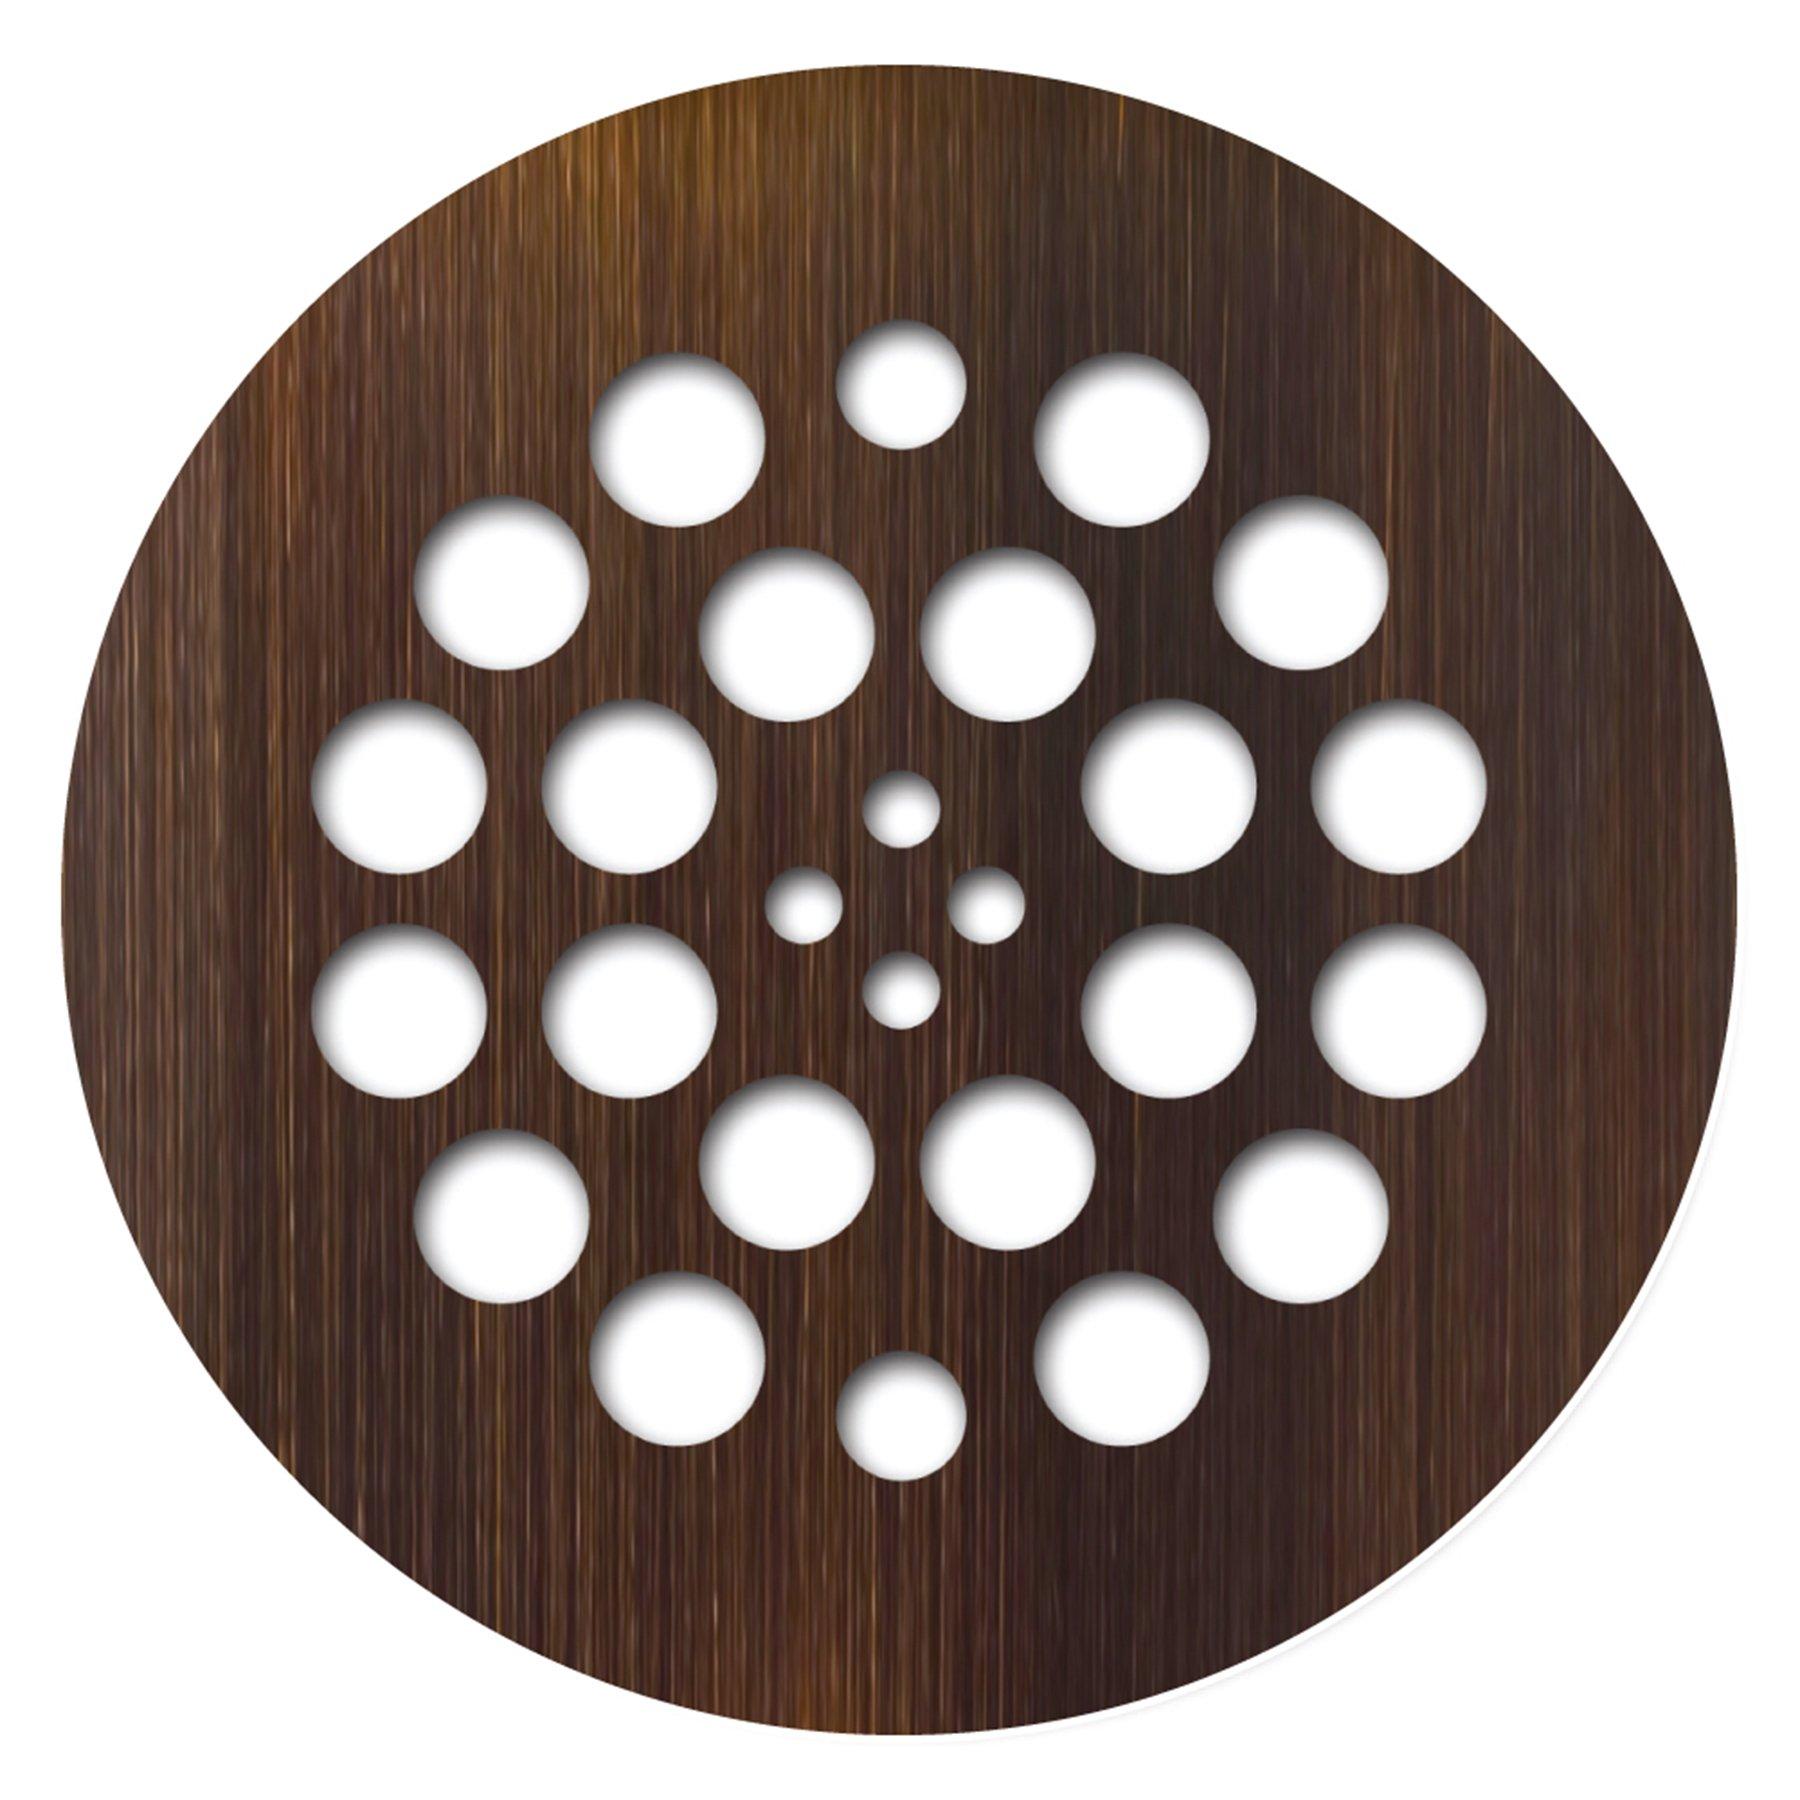 Tile Redi USA DP-RD-OB Shower Drain, 4.25''D x 4.25''W, Oil Rubbed Bronze by Tile Redi USA